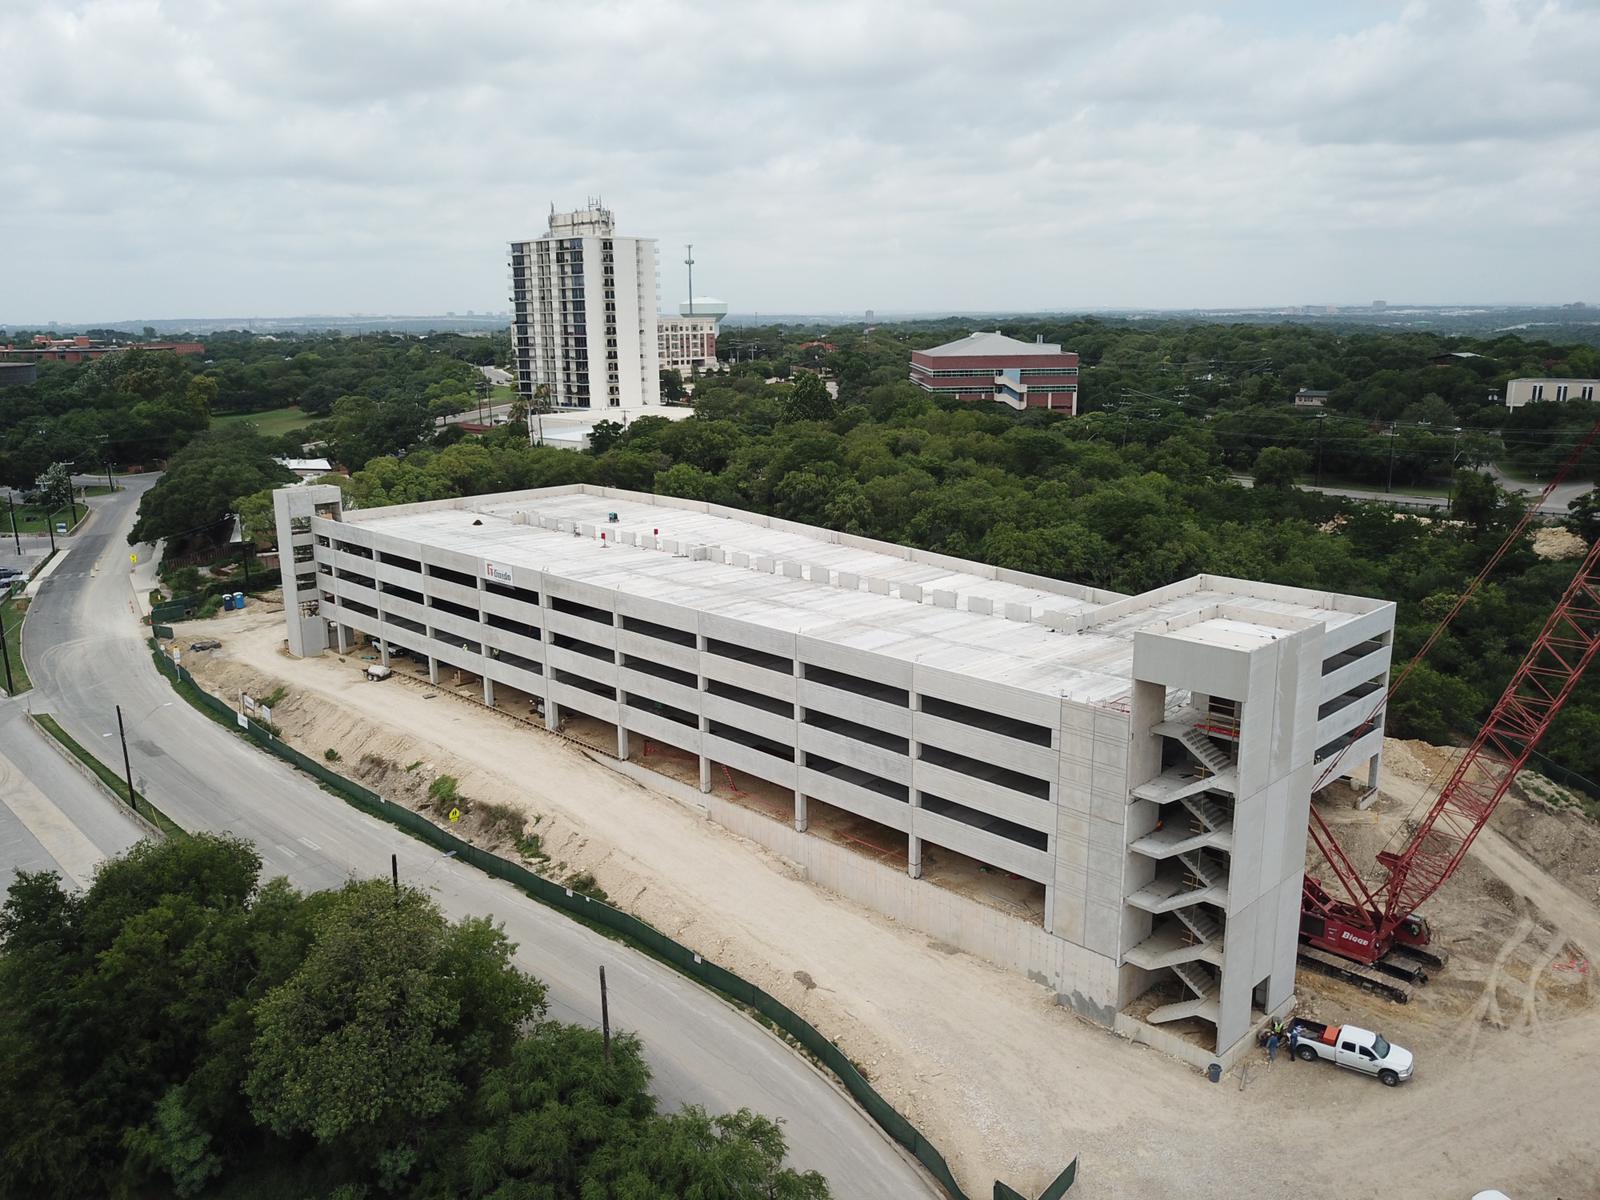 Photos show progress of new San Antonio Zoo parking garage